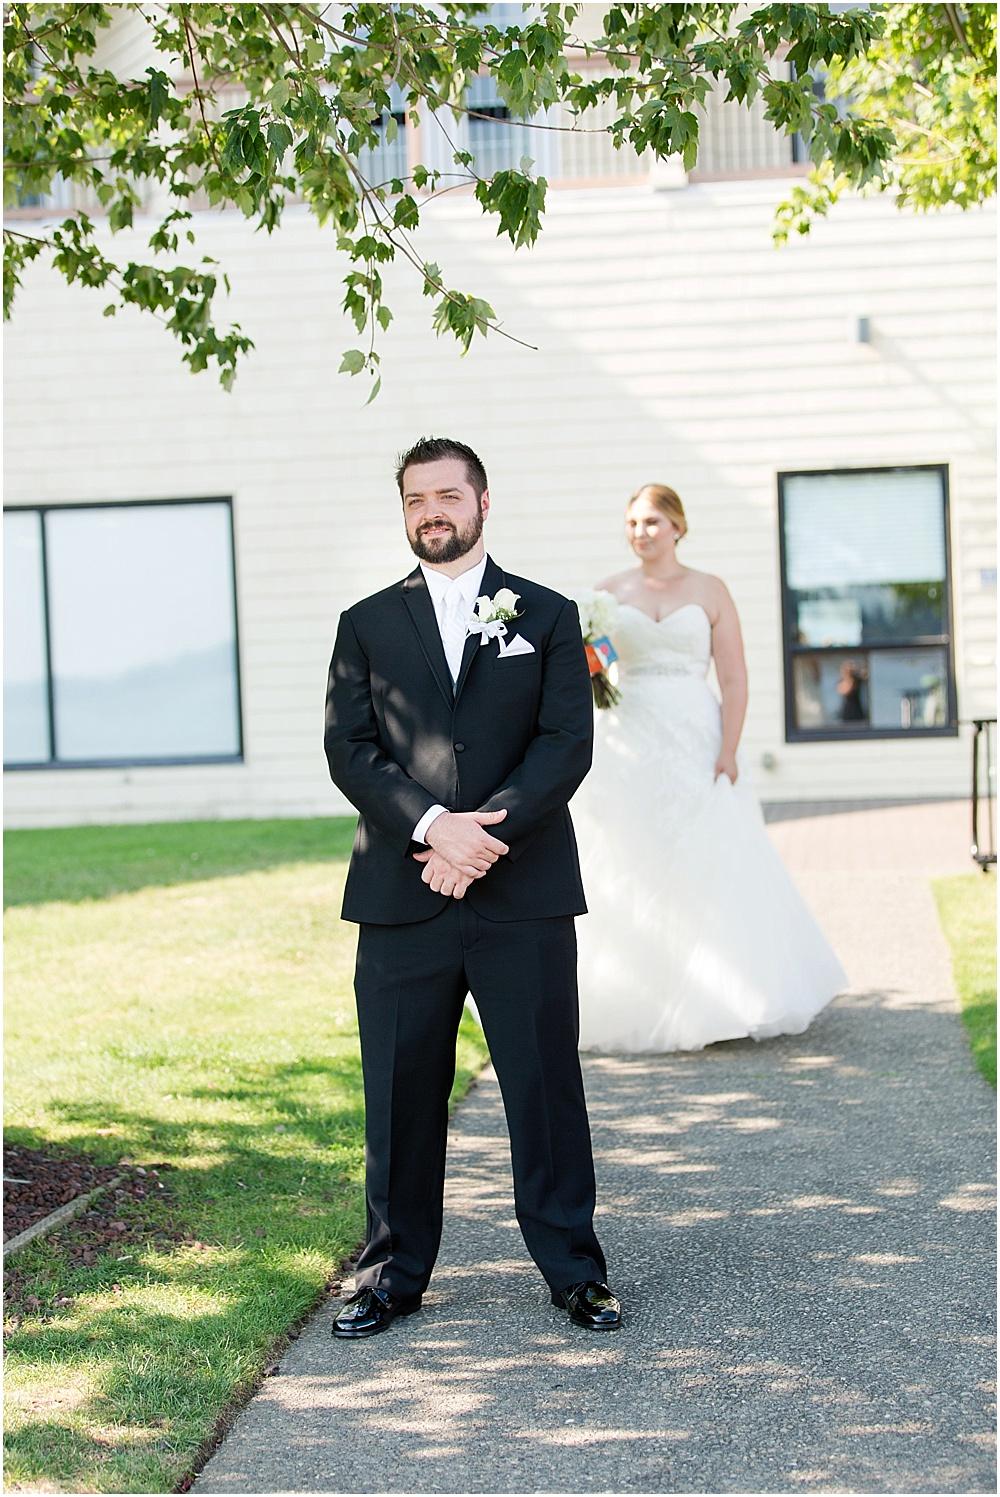 mitzner_silverdale_beach_hotel_wedding_silverdale_washington_pacific_northwest_wedding_photographer_0014